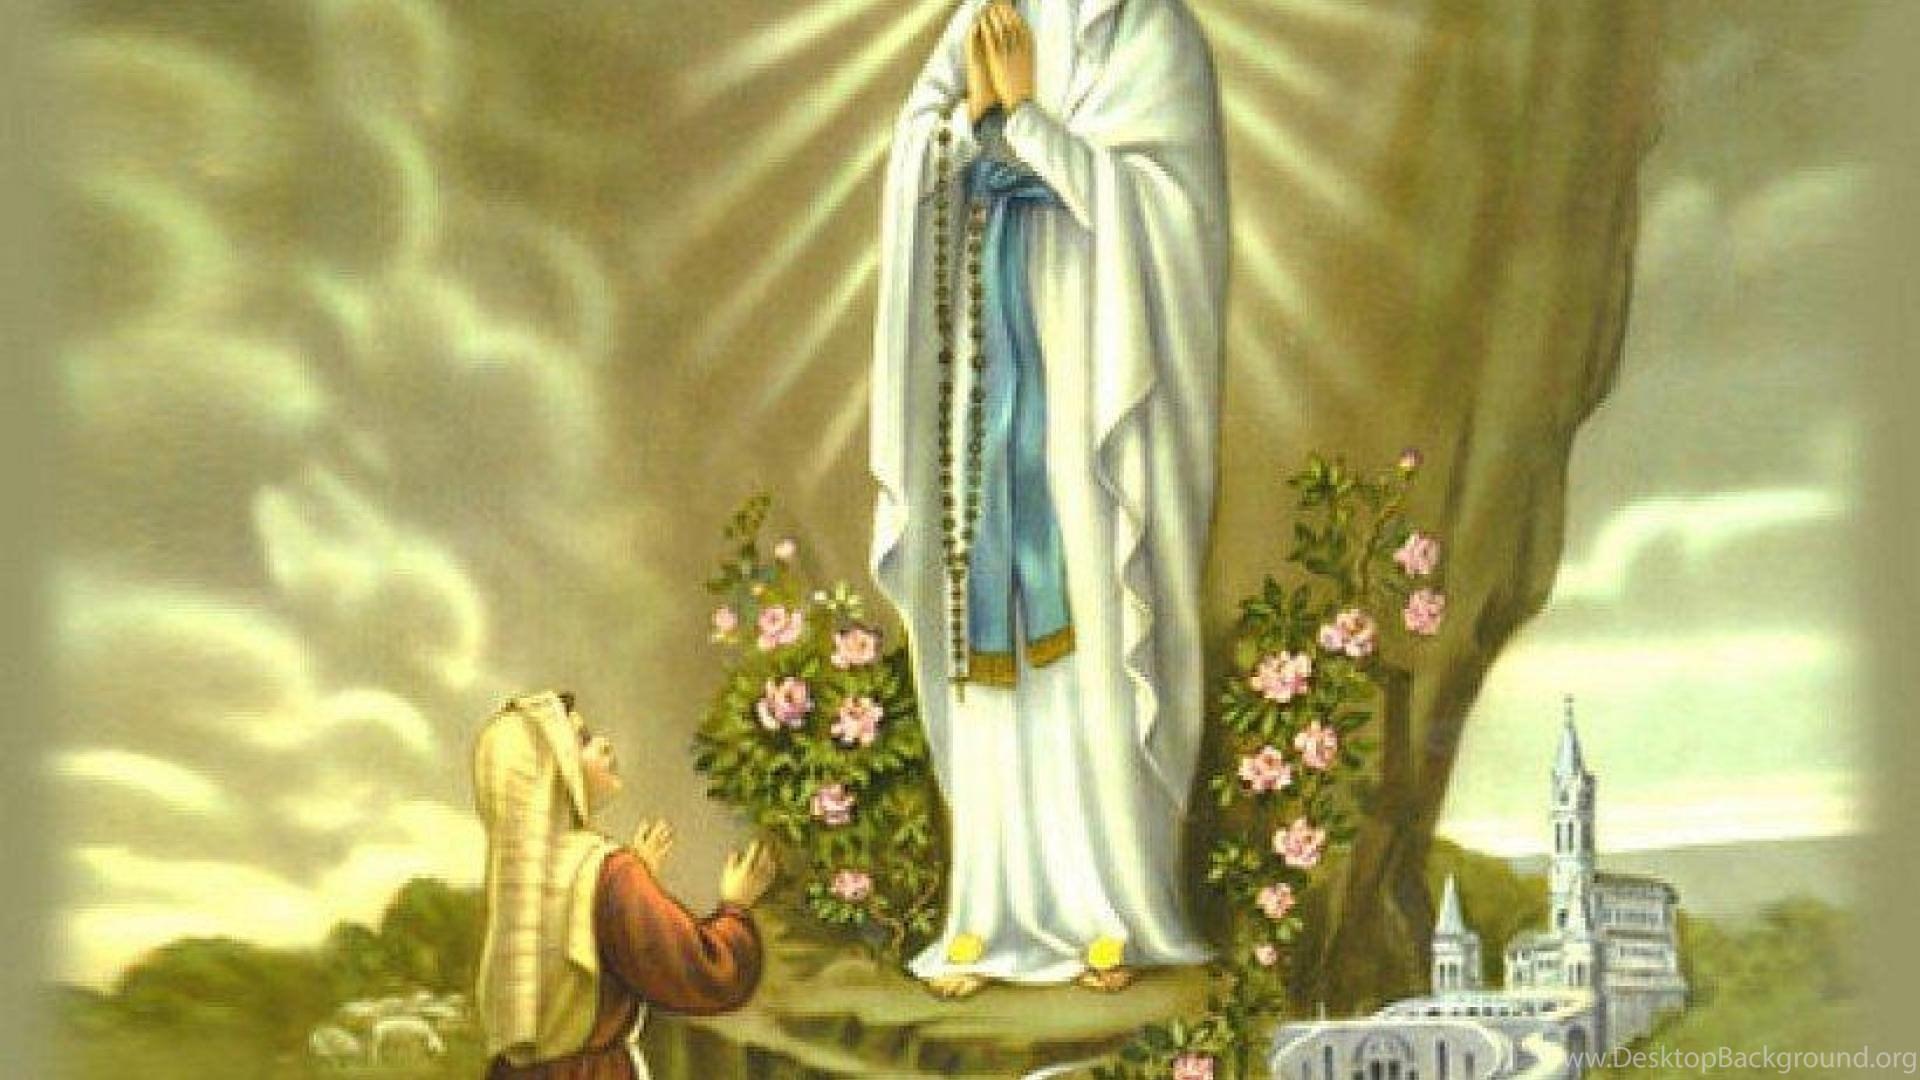 Wallpaper Virgin Mary Christ Christianity Goddess Glory Our